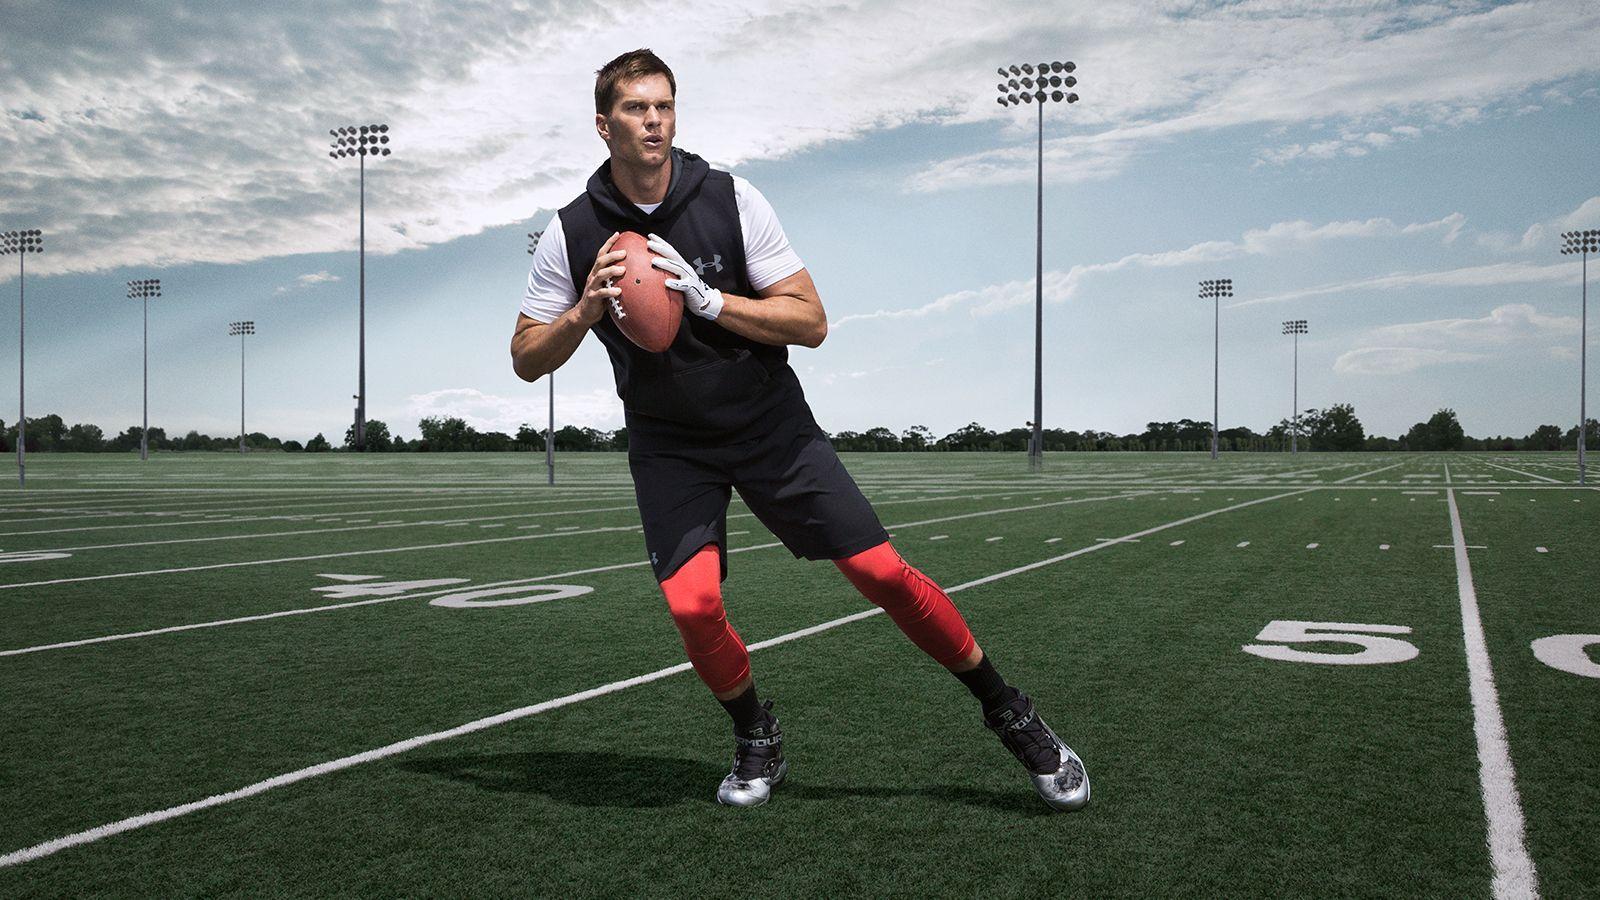 Tom Brady Shirts \u0026 Football Cleats